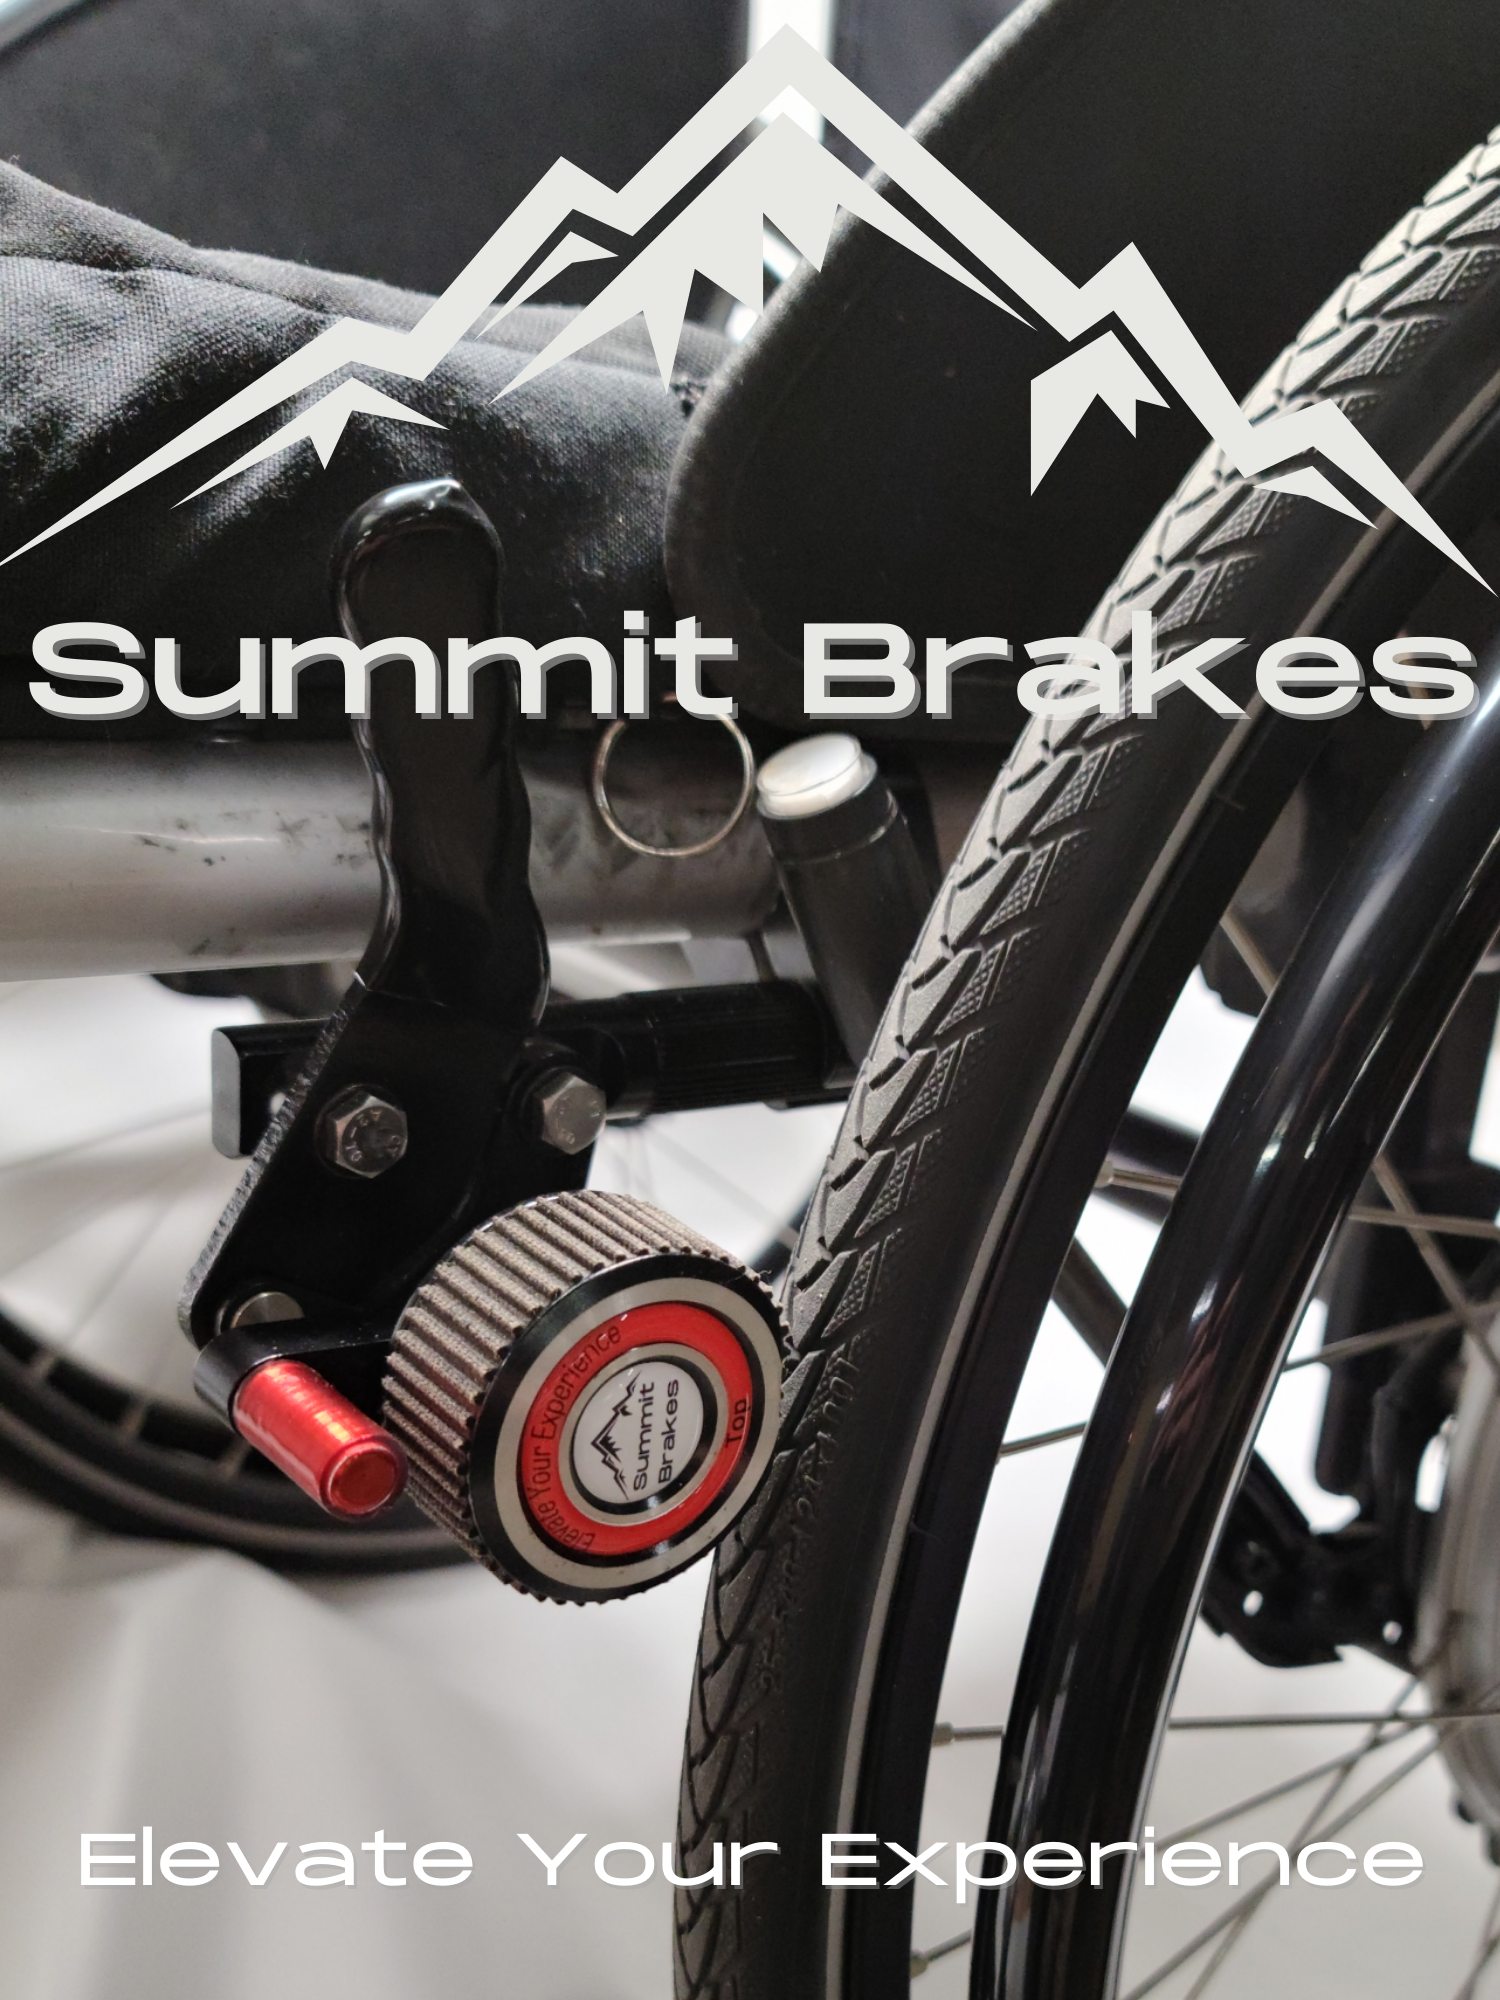 summit-wheelchair-brakes-anti-roll-back-anti-roll-roll-back-rollback-locks-11-.png